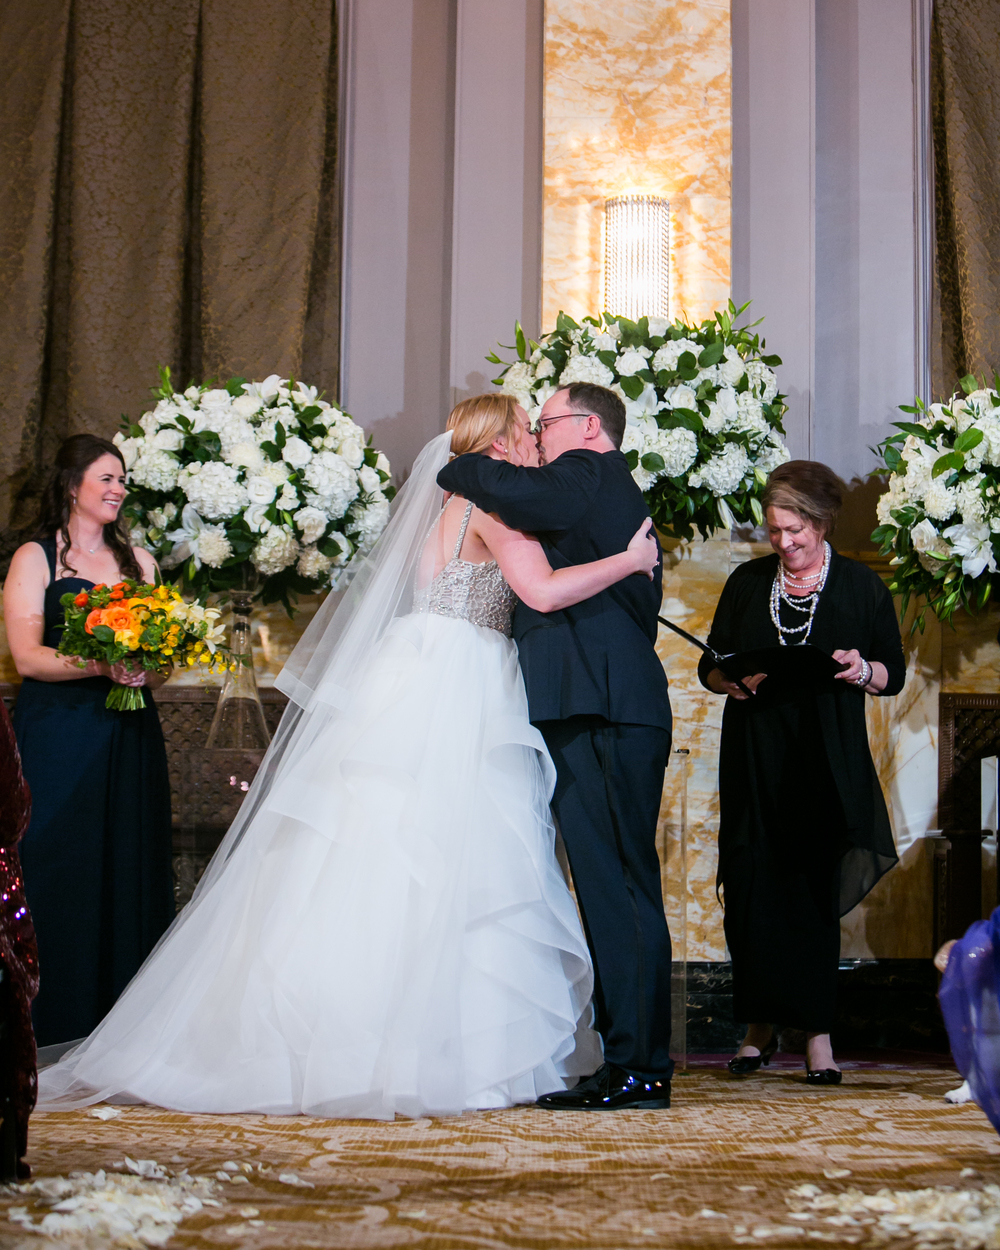 Wedding Rentals Portland Or: Melissa + Steve